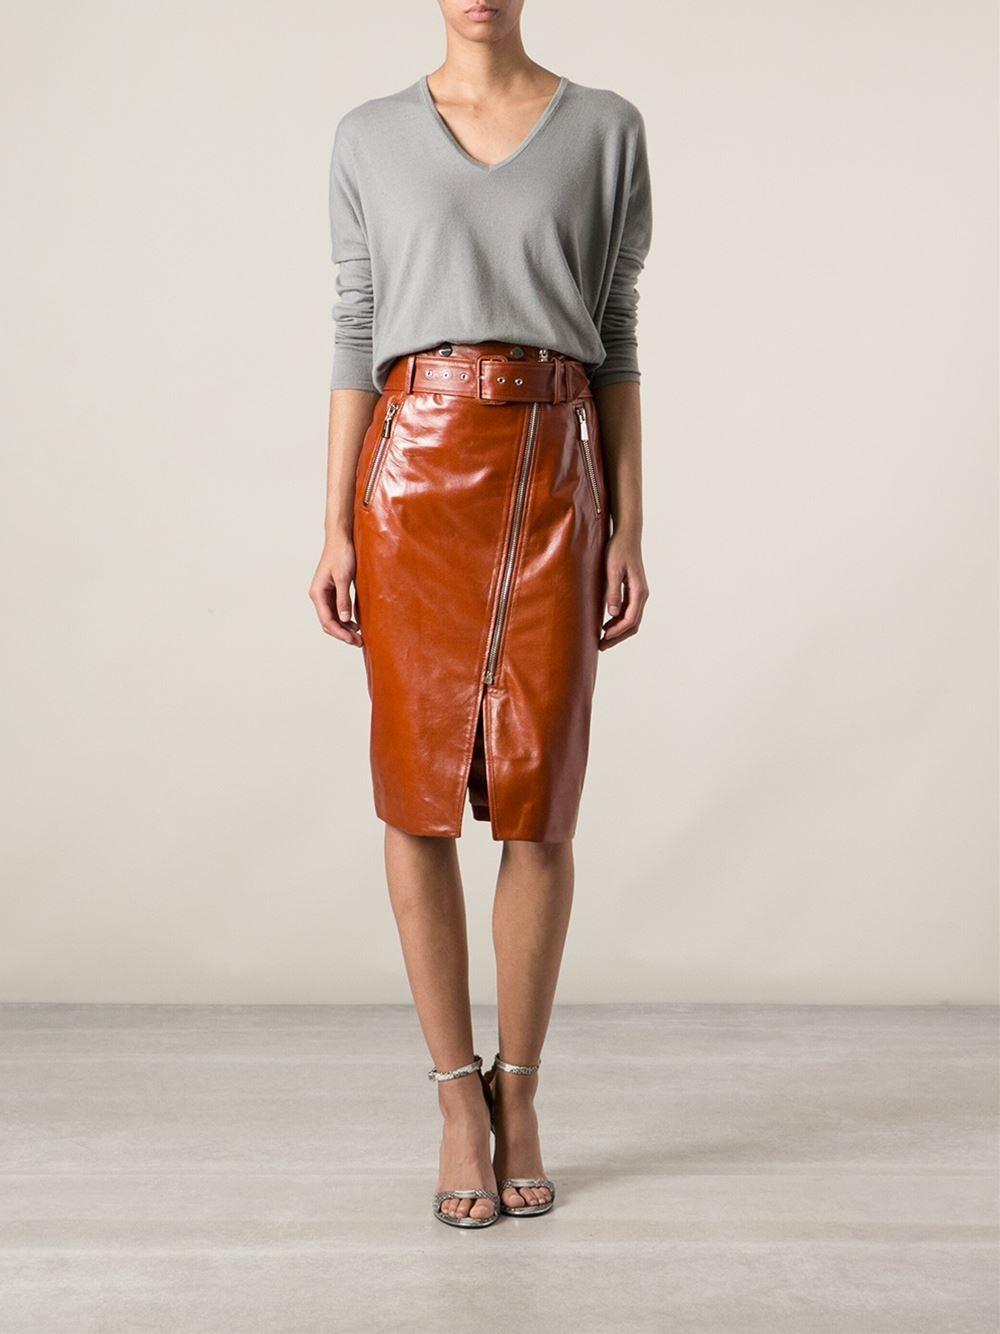 Jason Wu Leather Pencil Skirt - Apropos The Concept Store - Farfetch.com